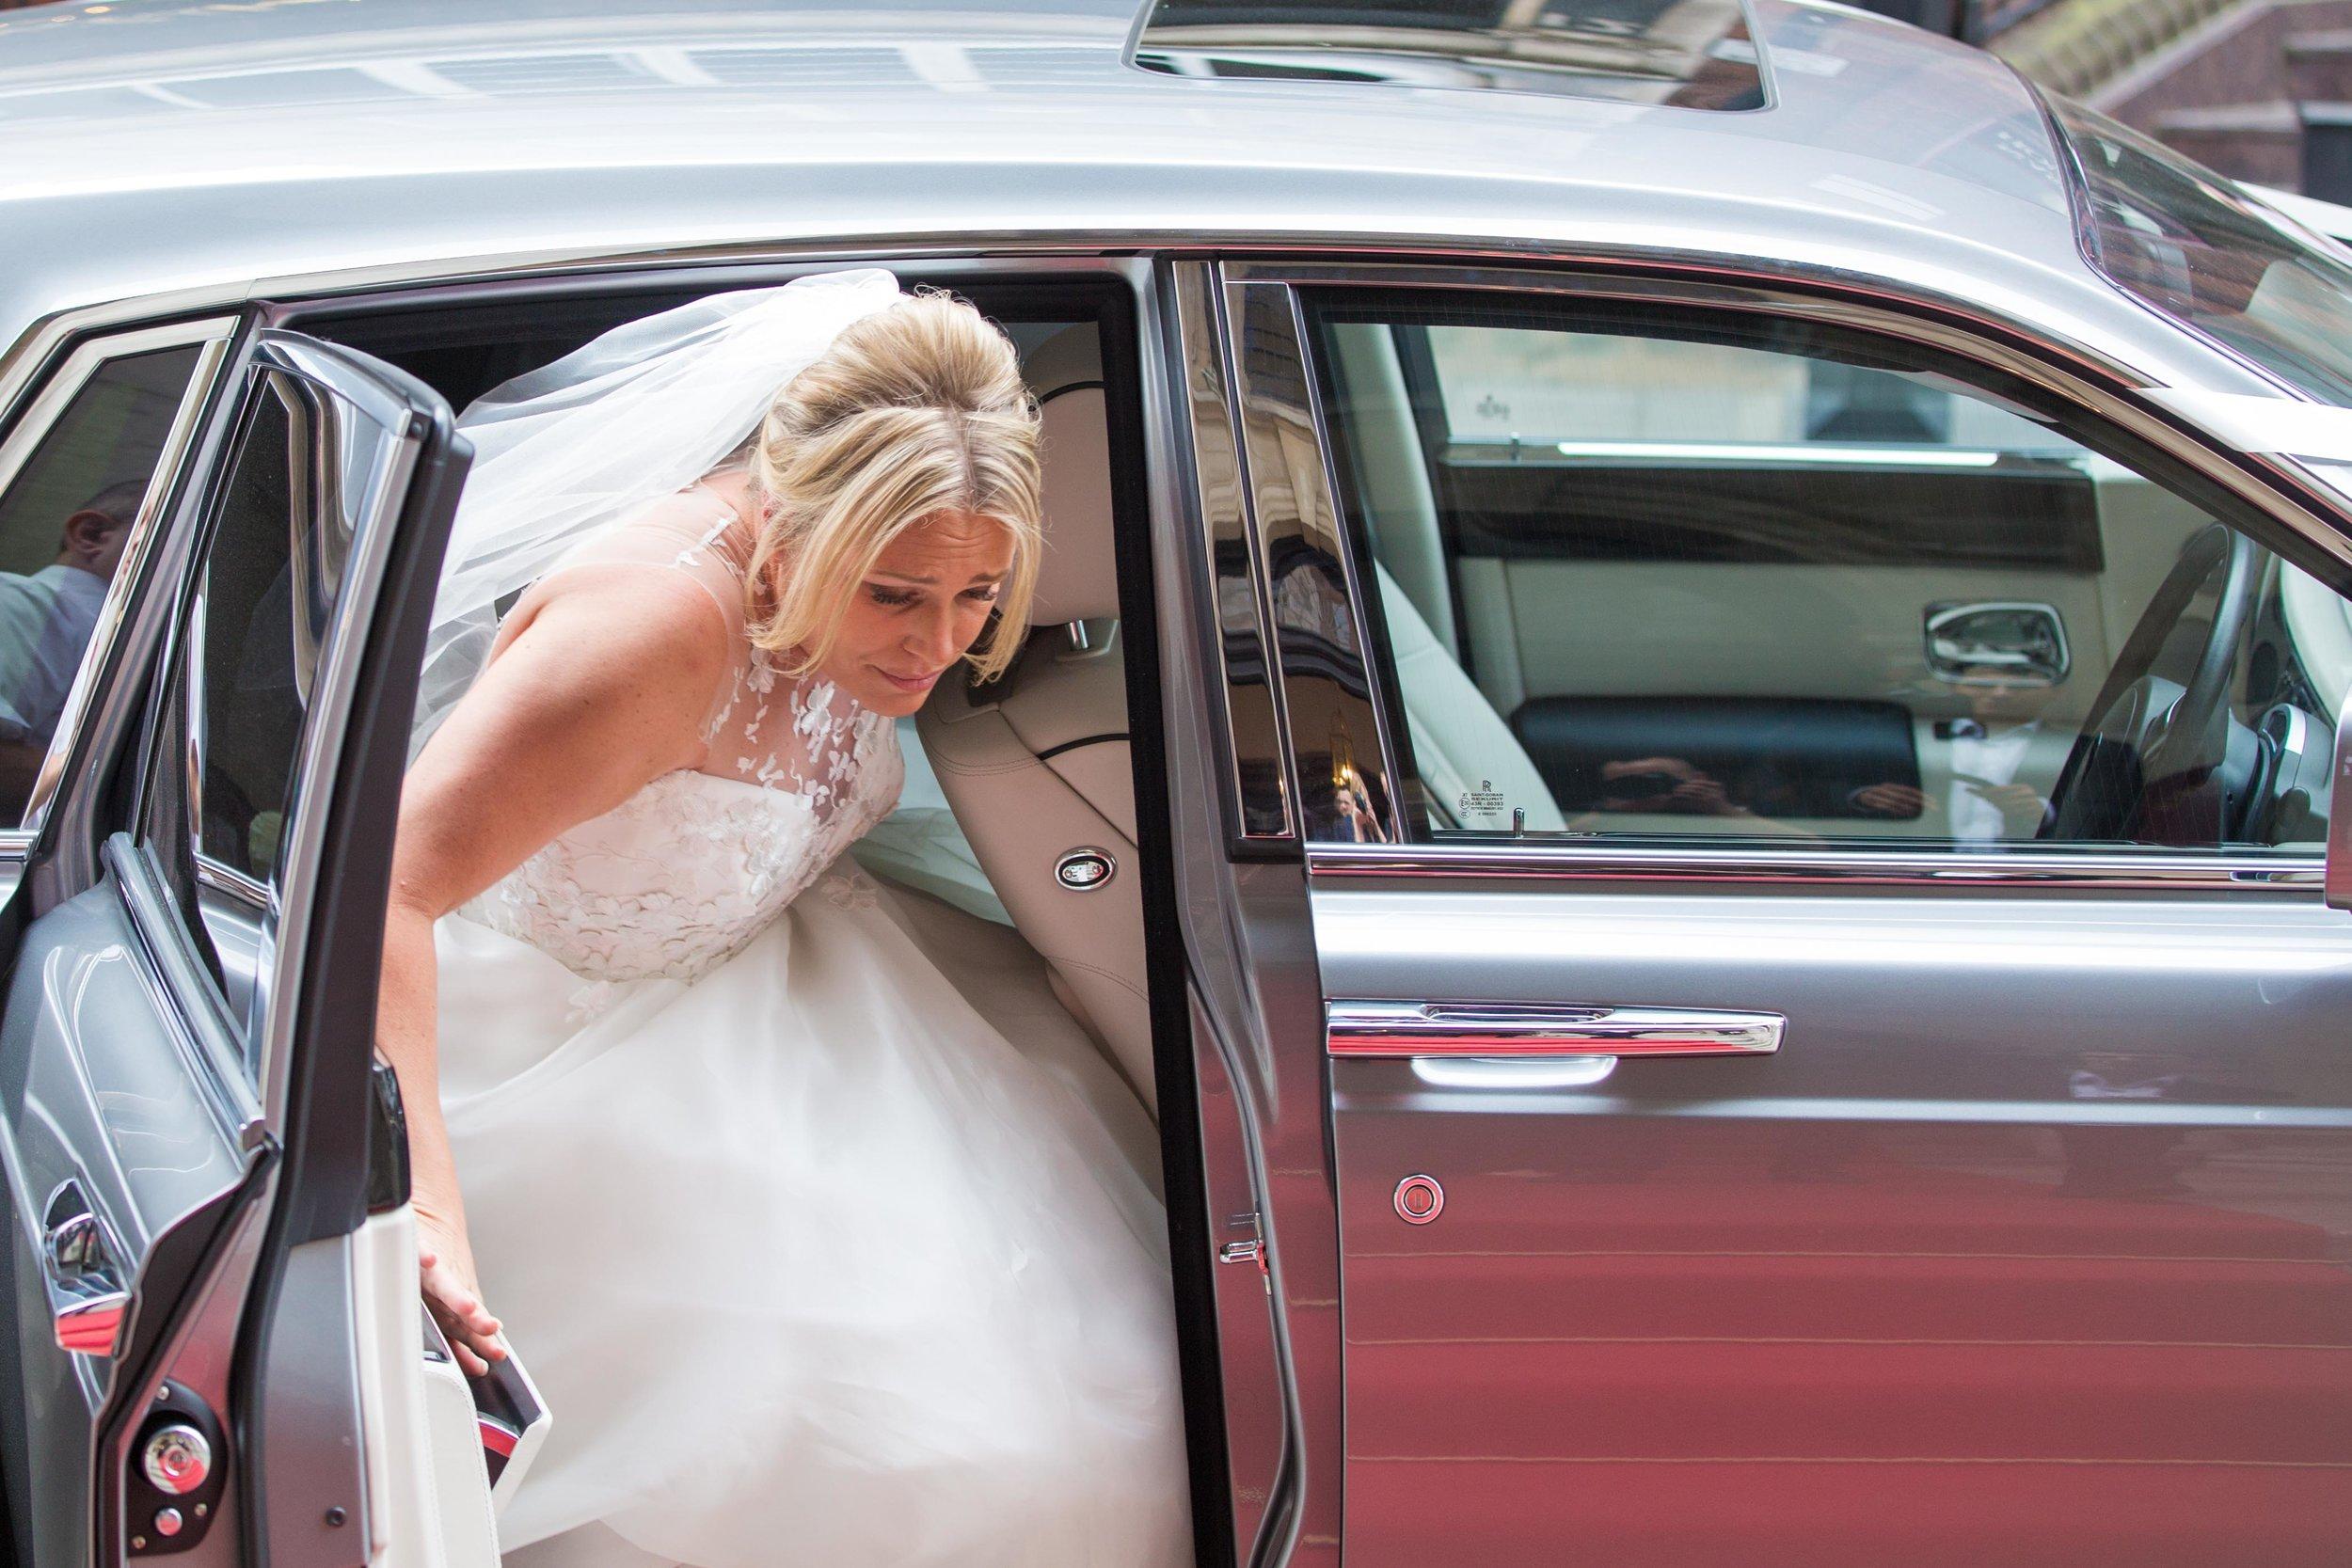 claridges-hotel-wedding-photographer-london-mayfair-natalia-smith-photography-51.jpg